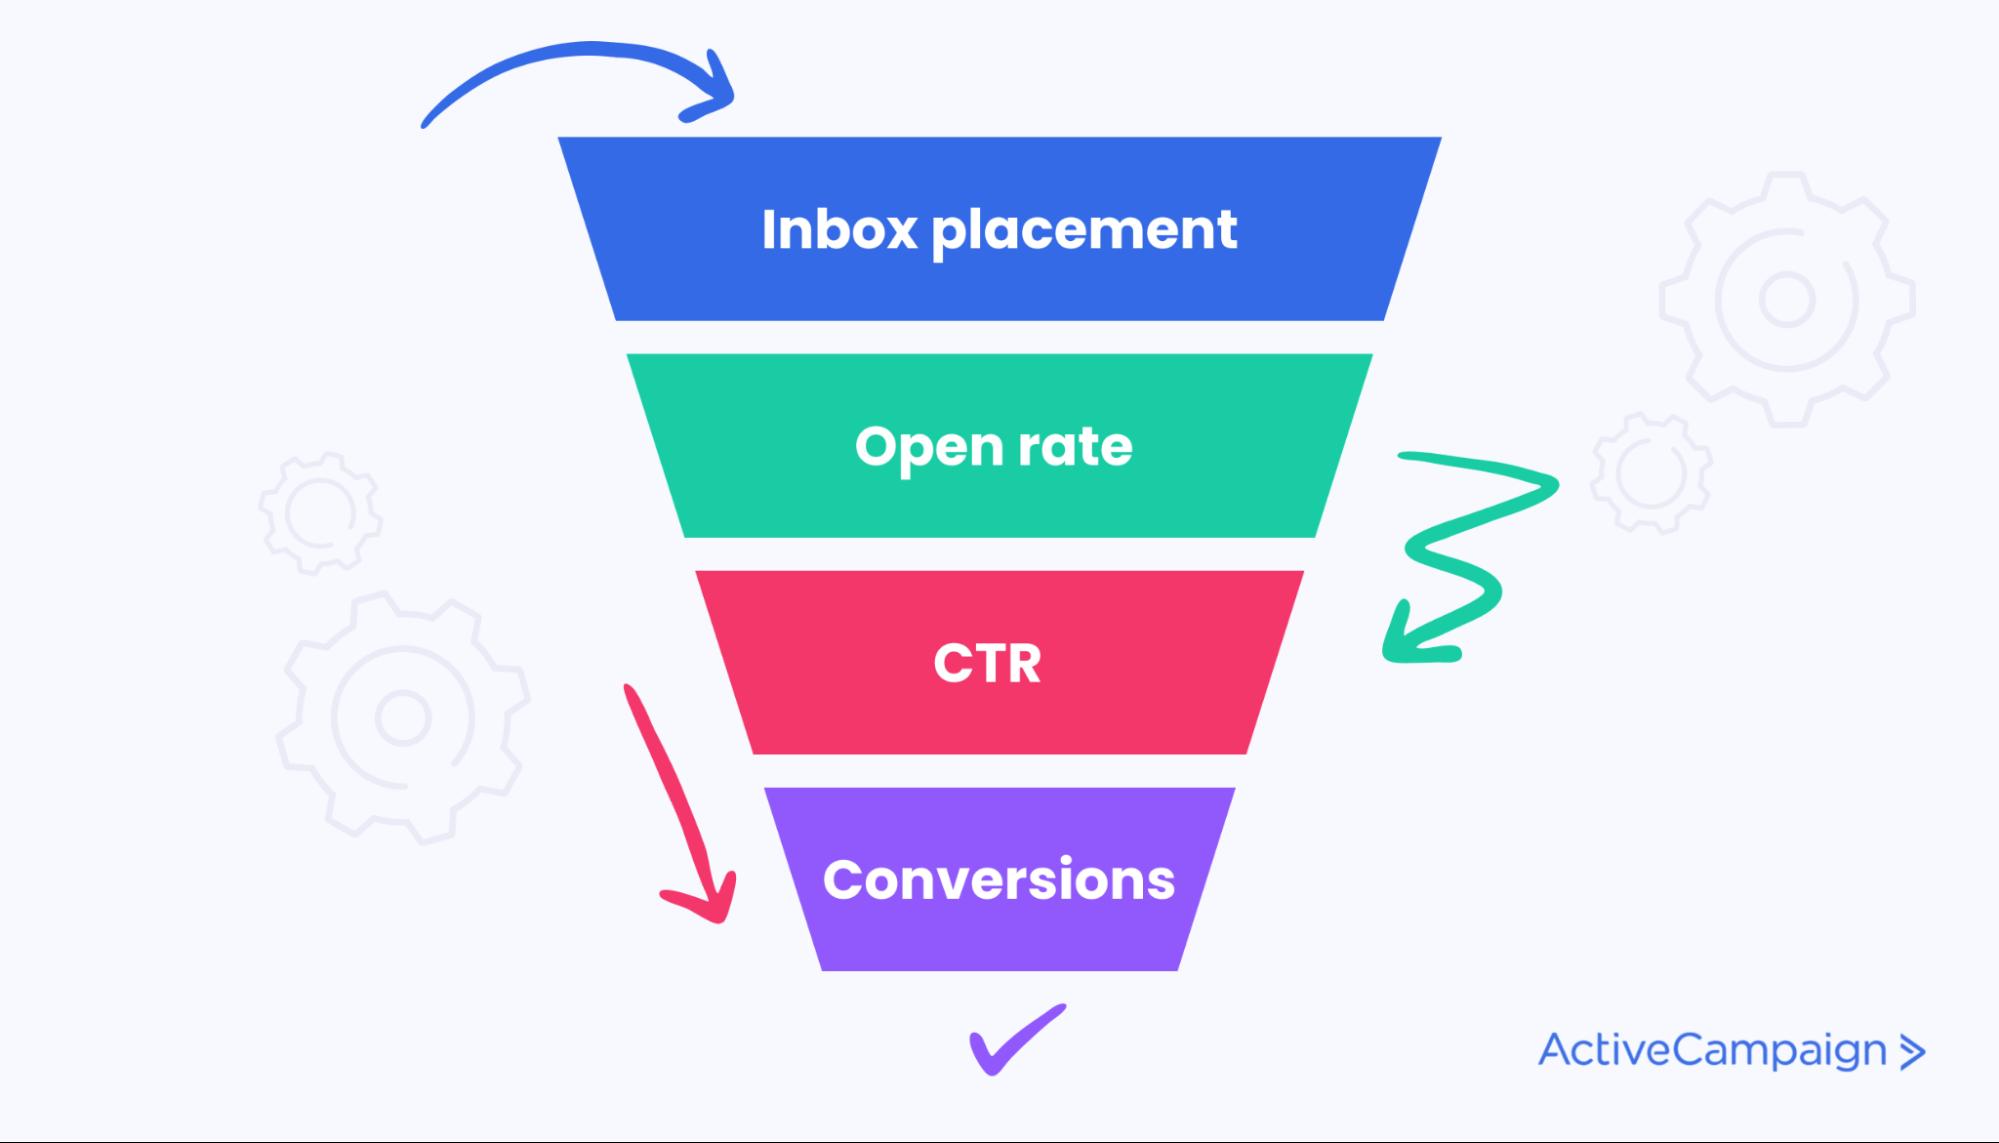 funnel email marketing metrics marketing campaign kpis